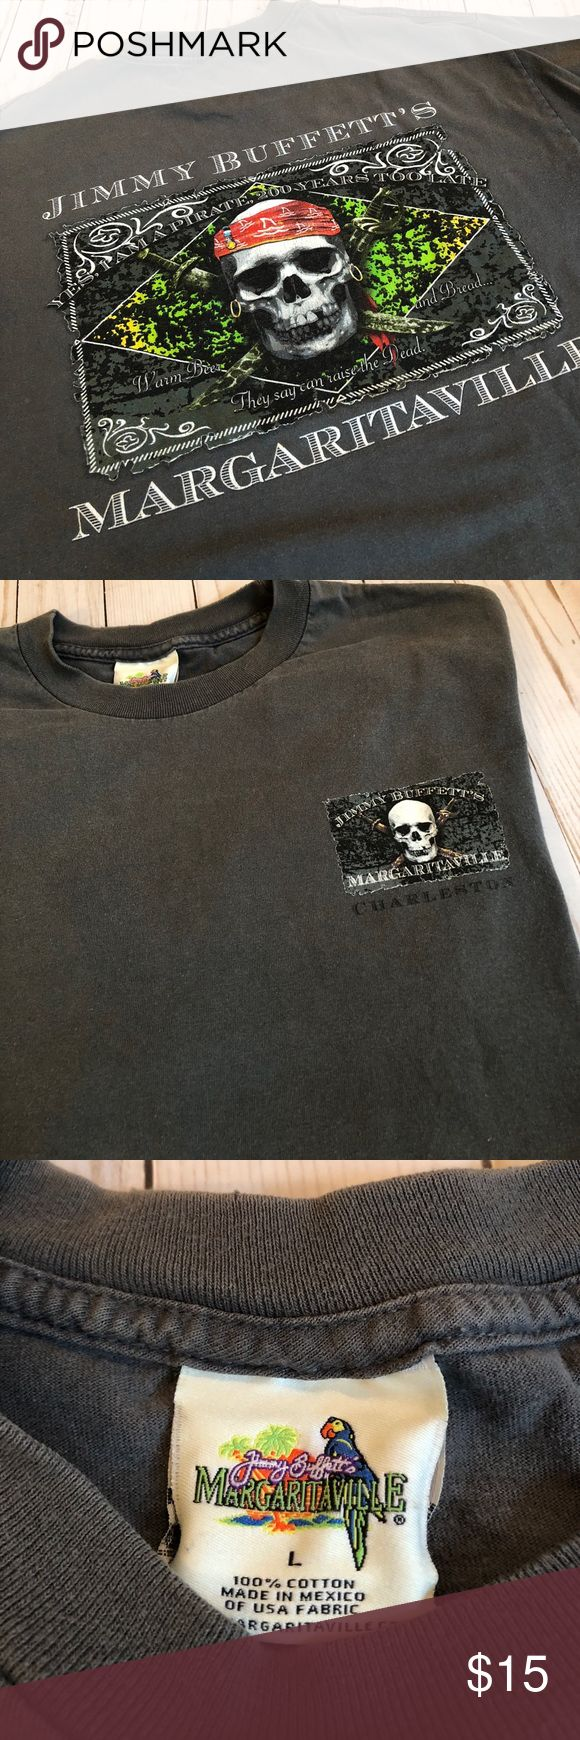 Jimmy Buffett Margaritaville Pirate Shirt Large EUC jimmy Buffett Margaritaville Short Sleeve Pirate Shirt. No rips, or stains . Smoke free home. 22in pit to pit. Jimmy Buffett Margaritaville Shirts Tees - Short Sleeve